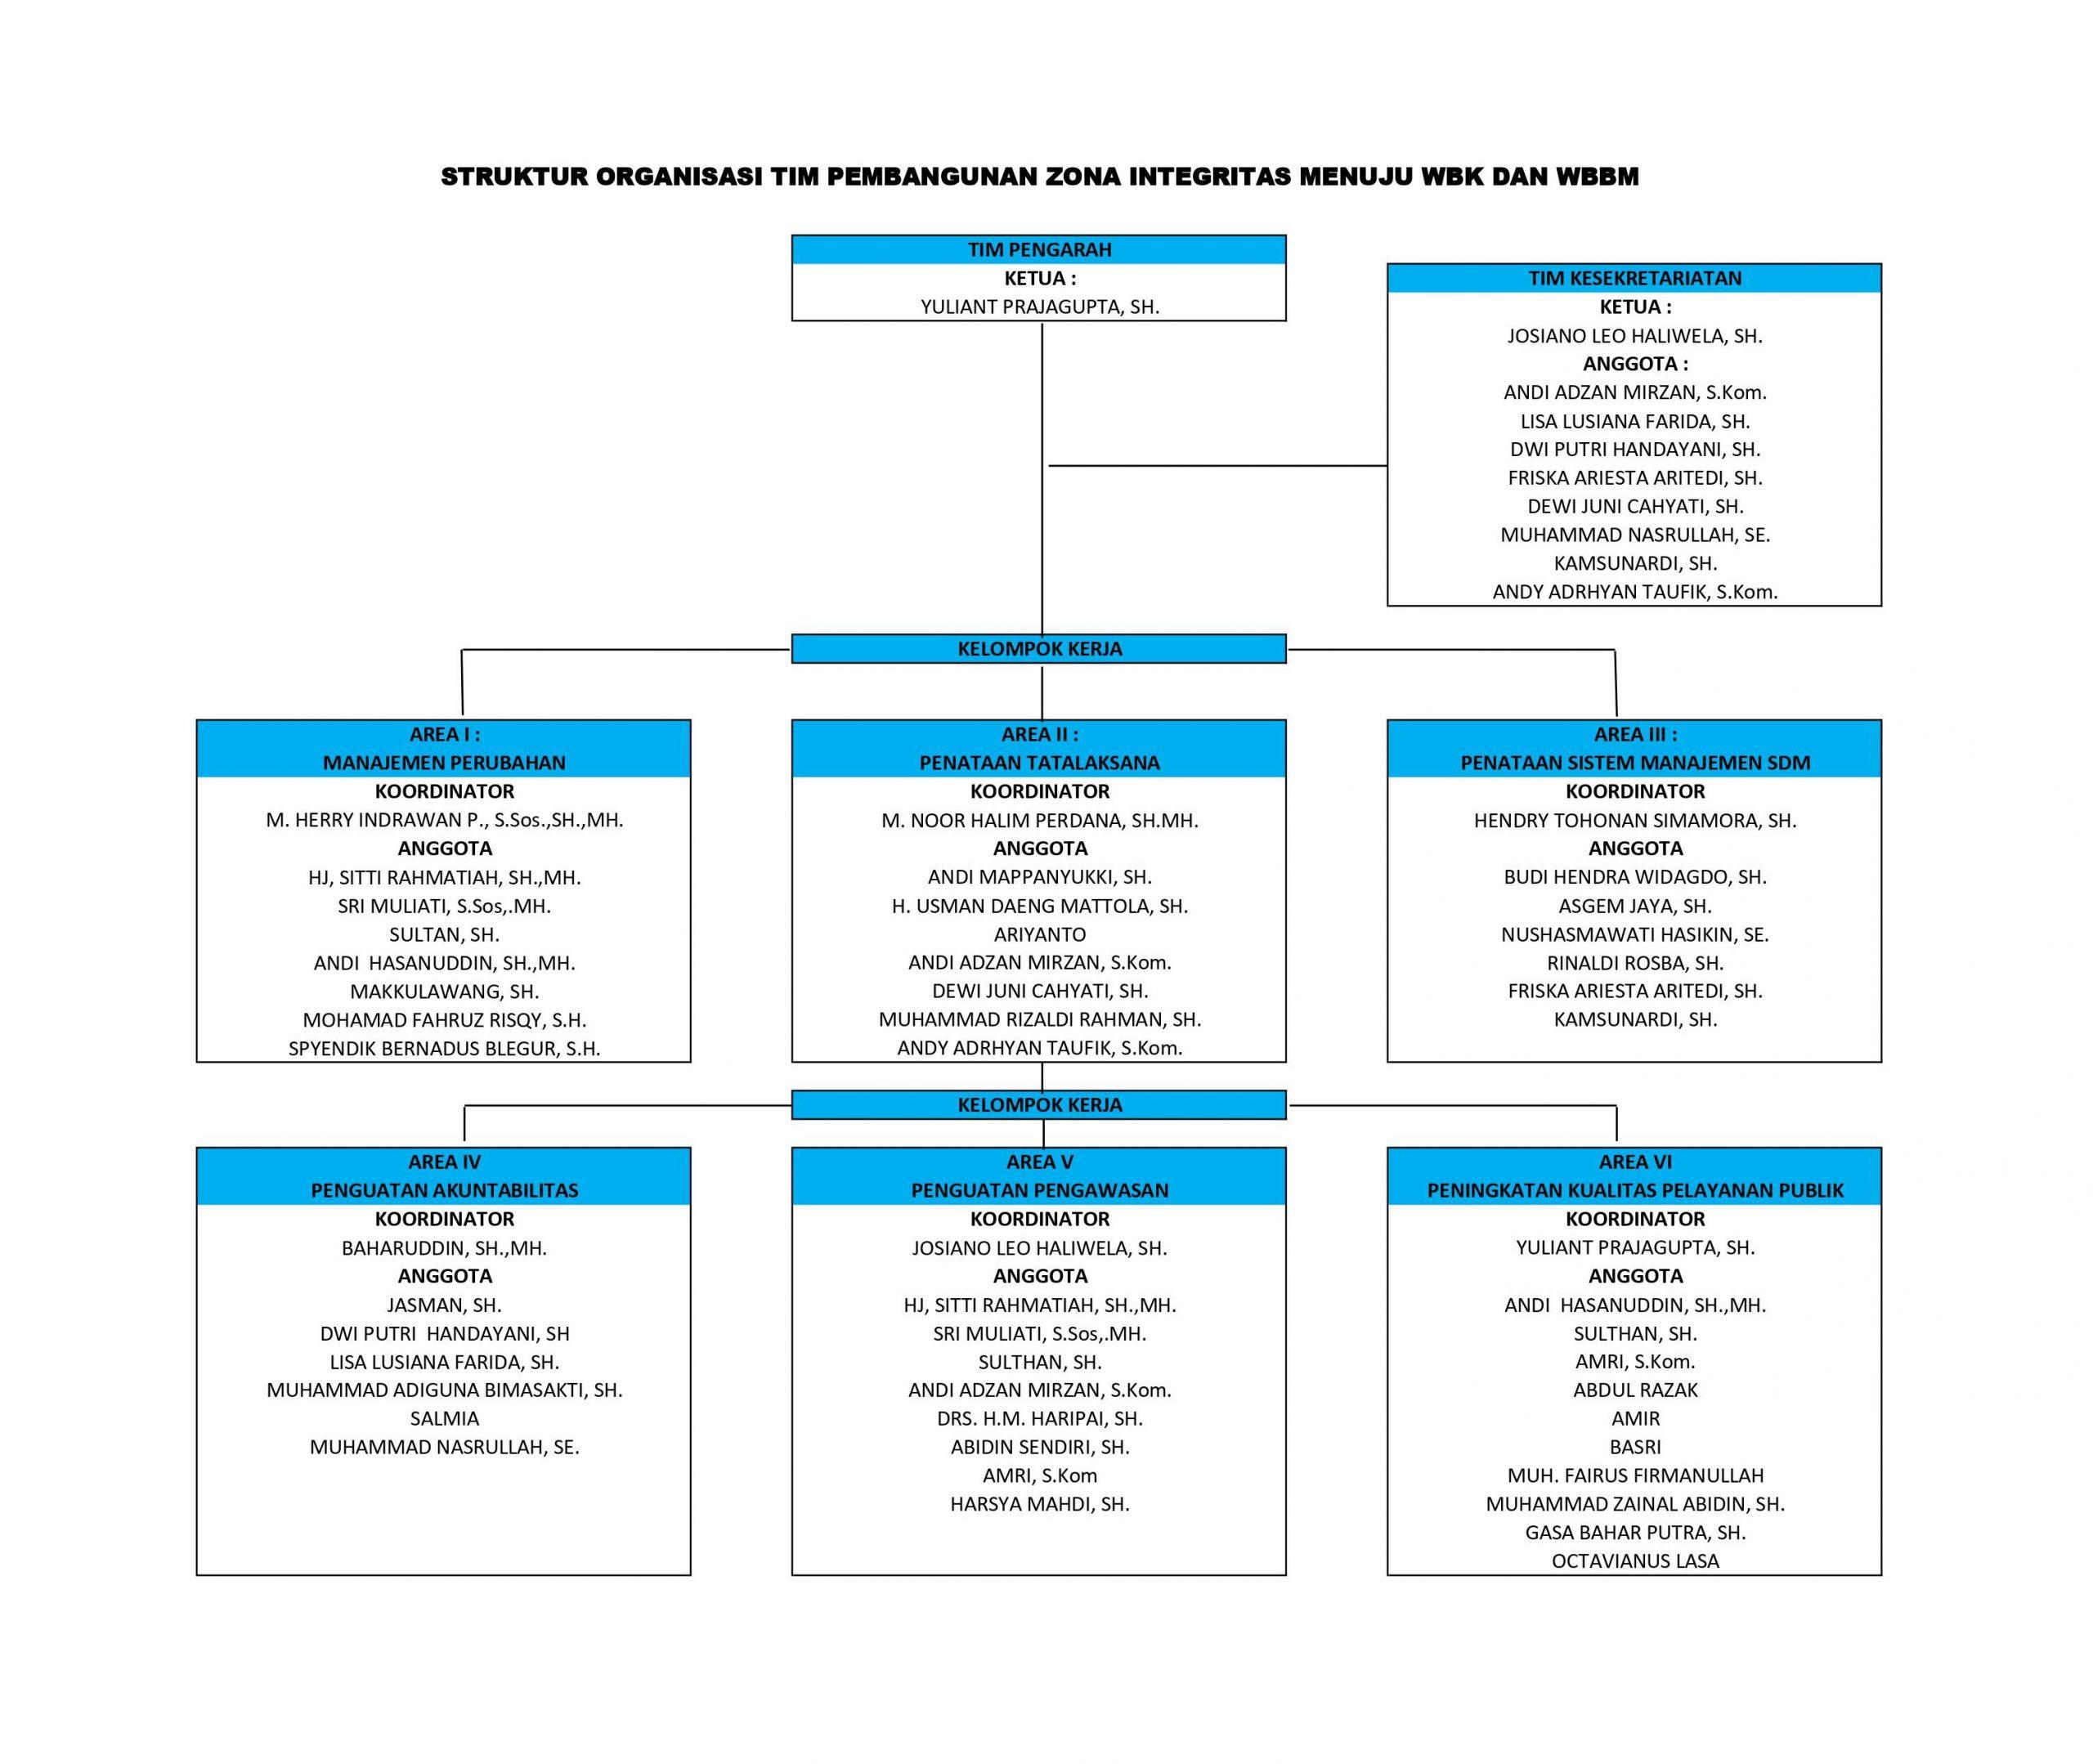 Struktur Organisasi Pembangunan Zona Integritas Menuju Wbk Dan Wbbm Pengadilan Tata Usaha Negara Makassar